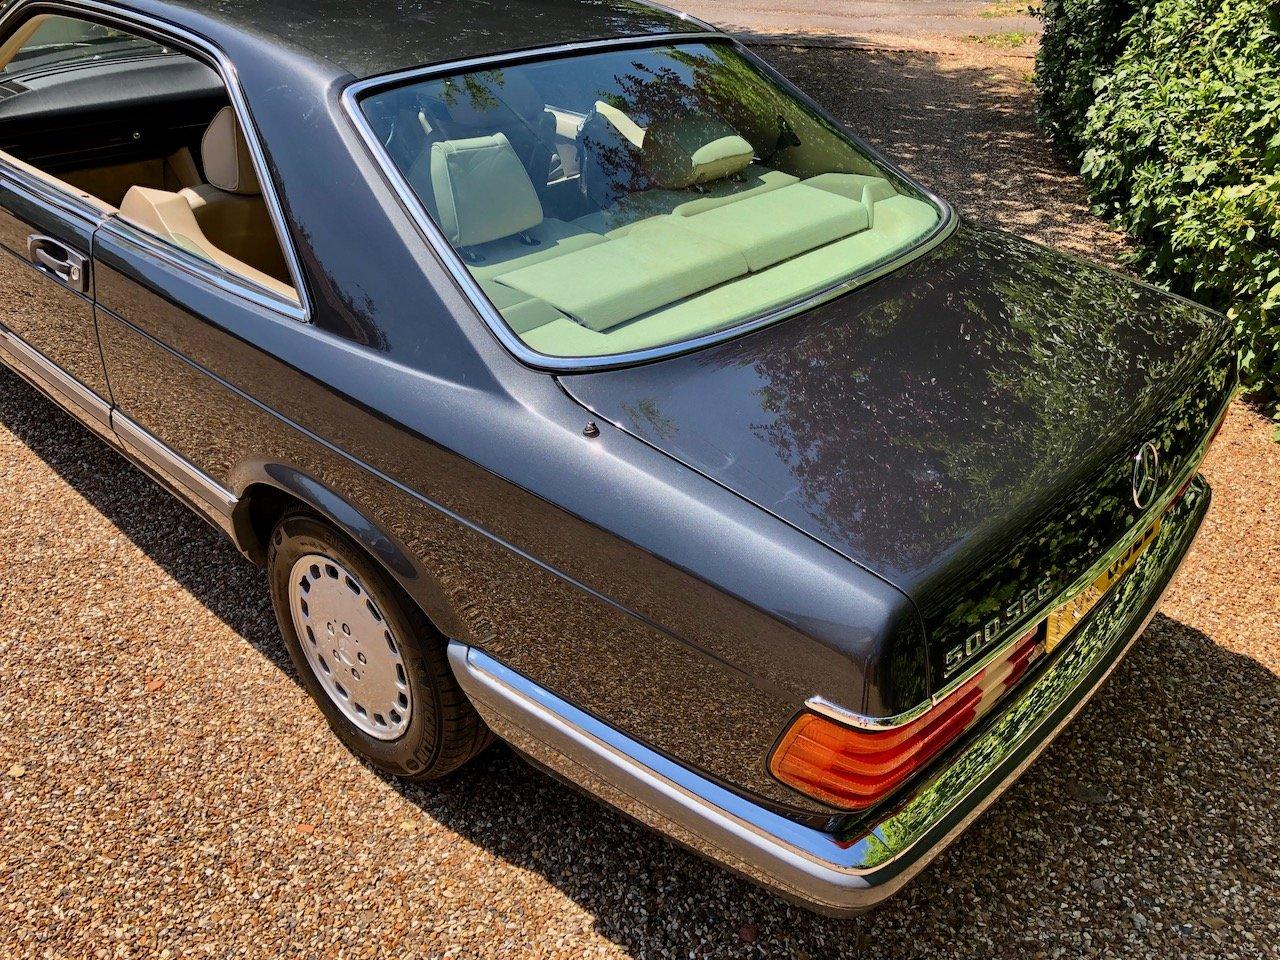 1989 **DEPOSIT TAKEN** Mercedes 500SEC C126 560SEC 420 SEC For Sale (picture 4 of 6)